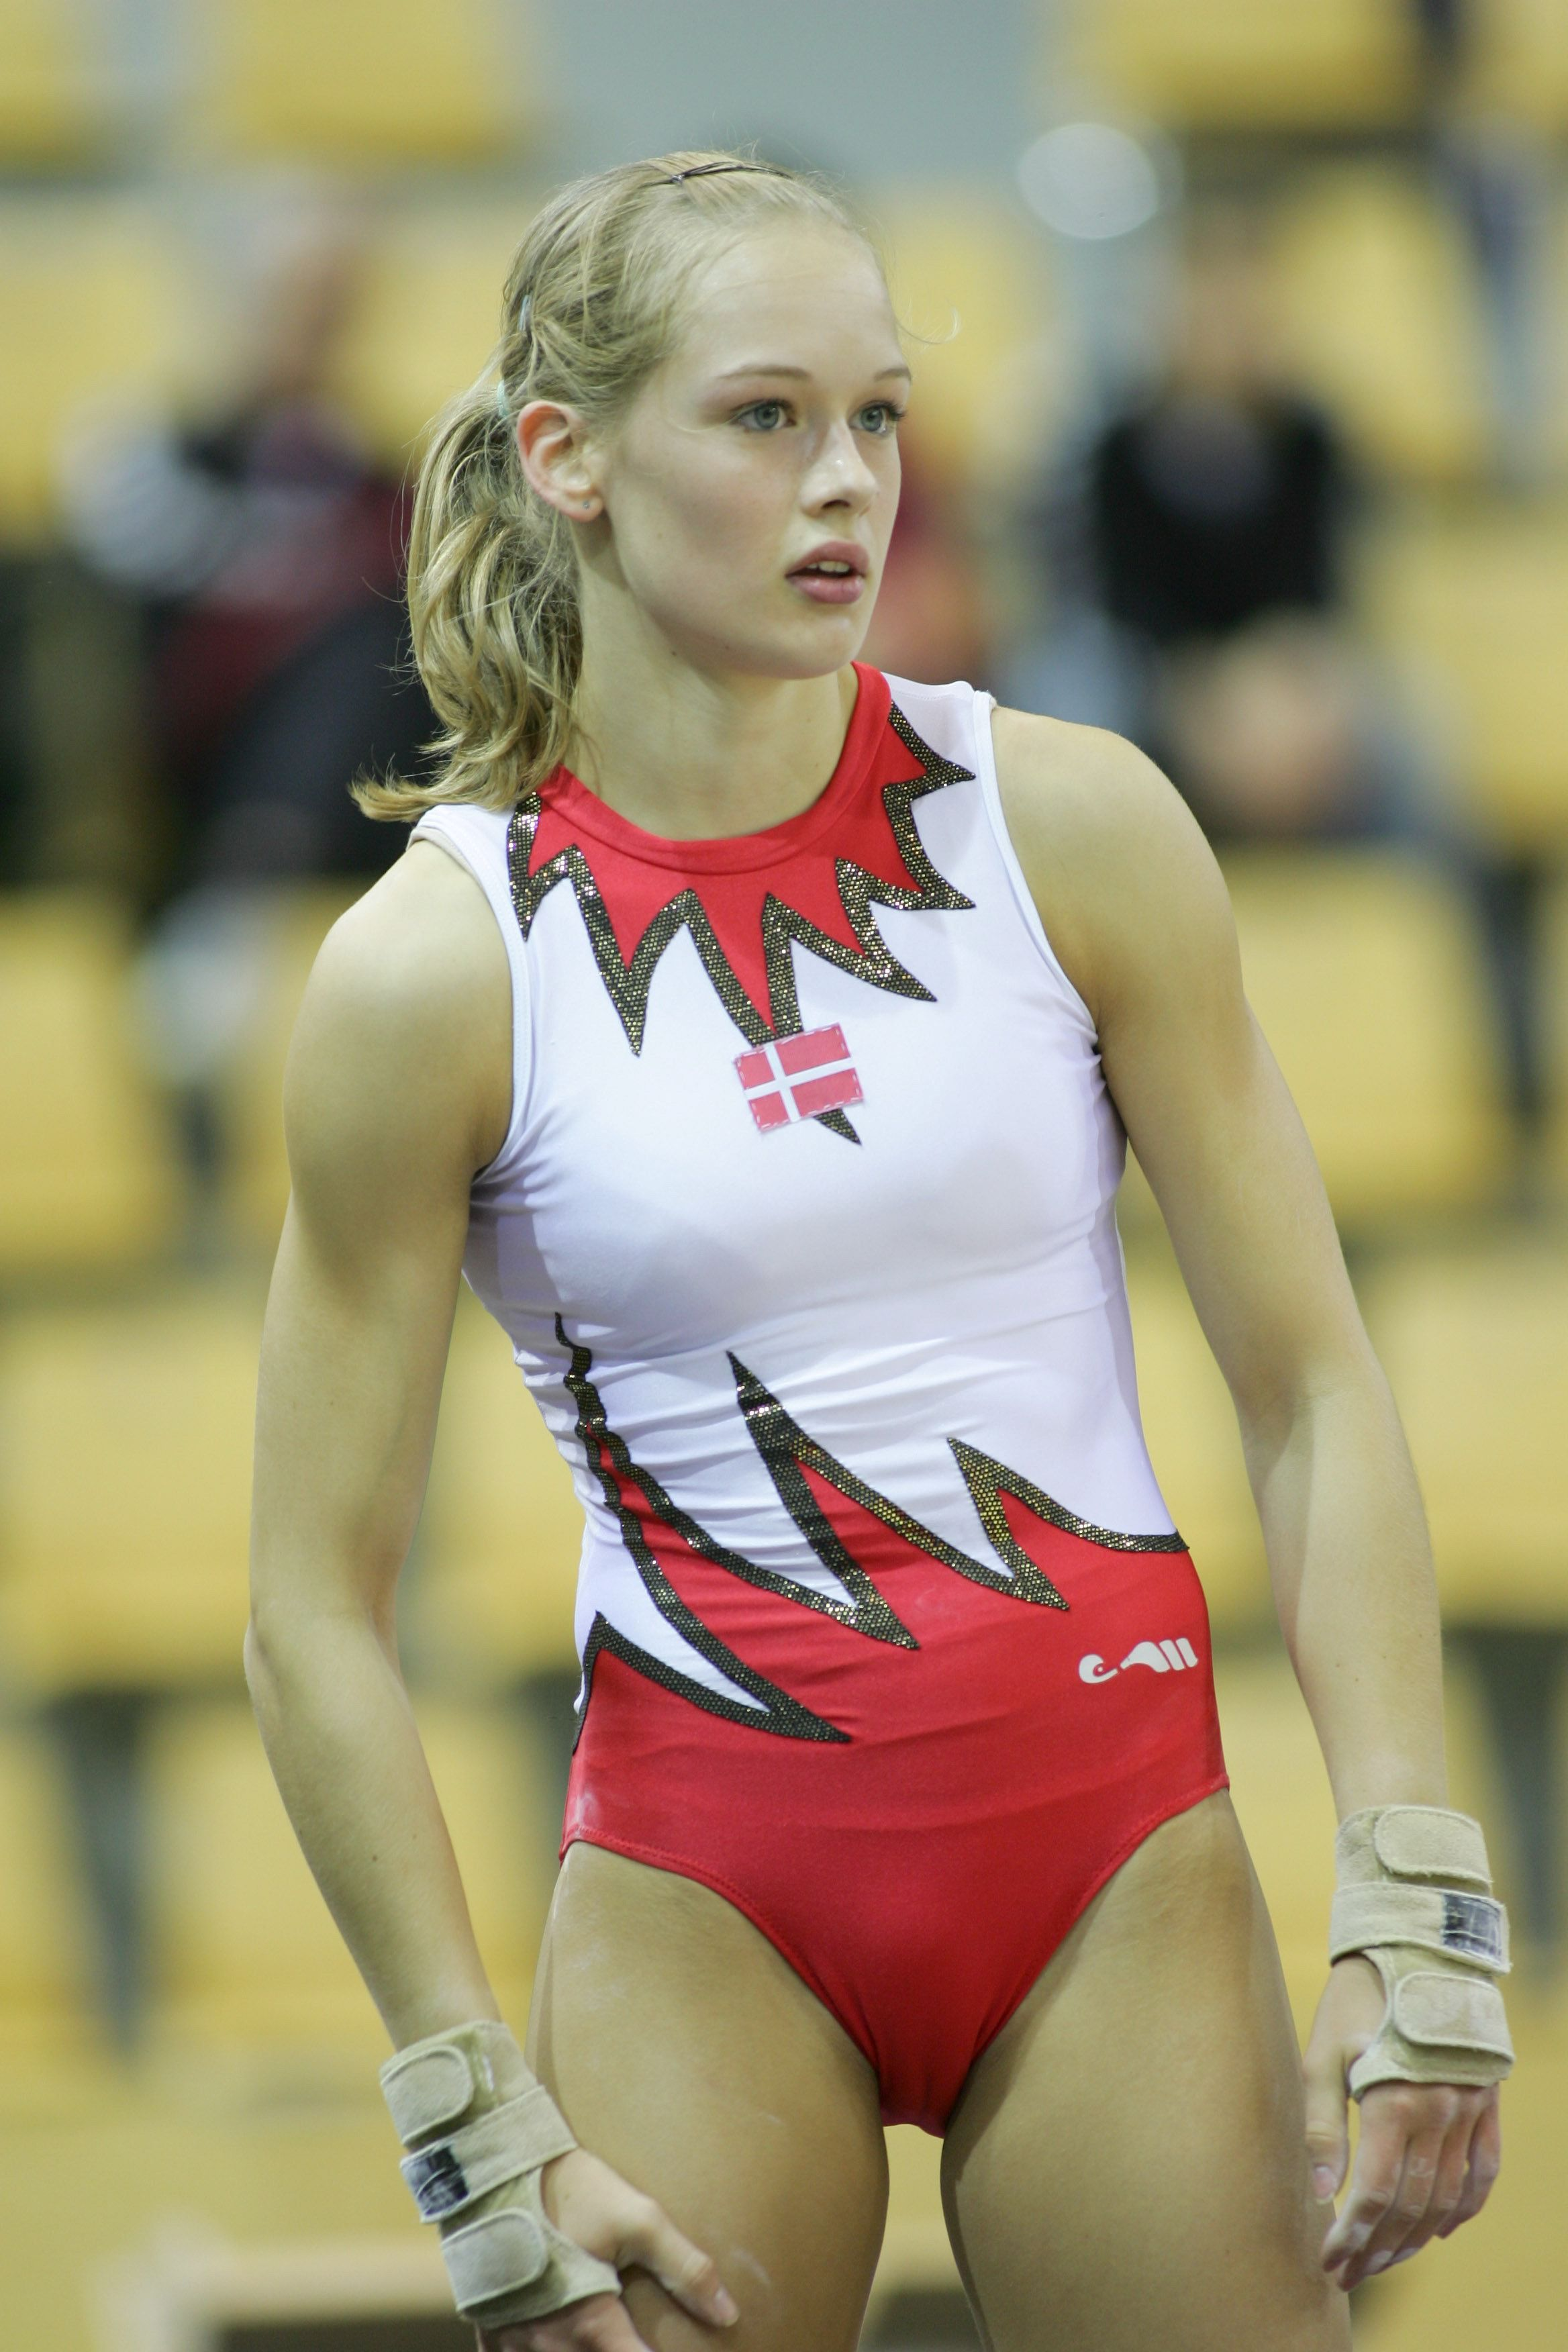 Gymnastics Wardrobe Malfunction Nsfw